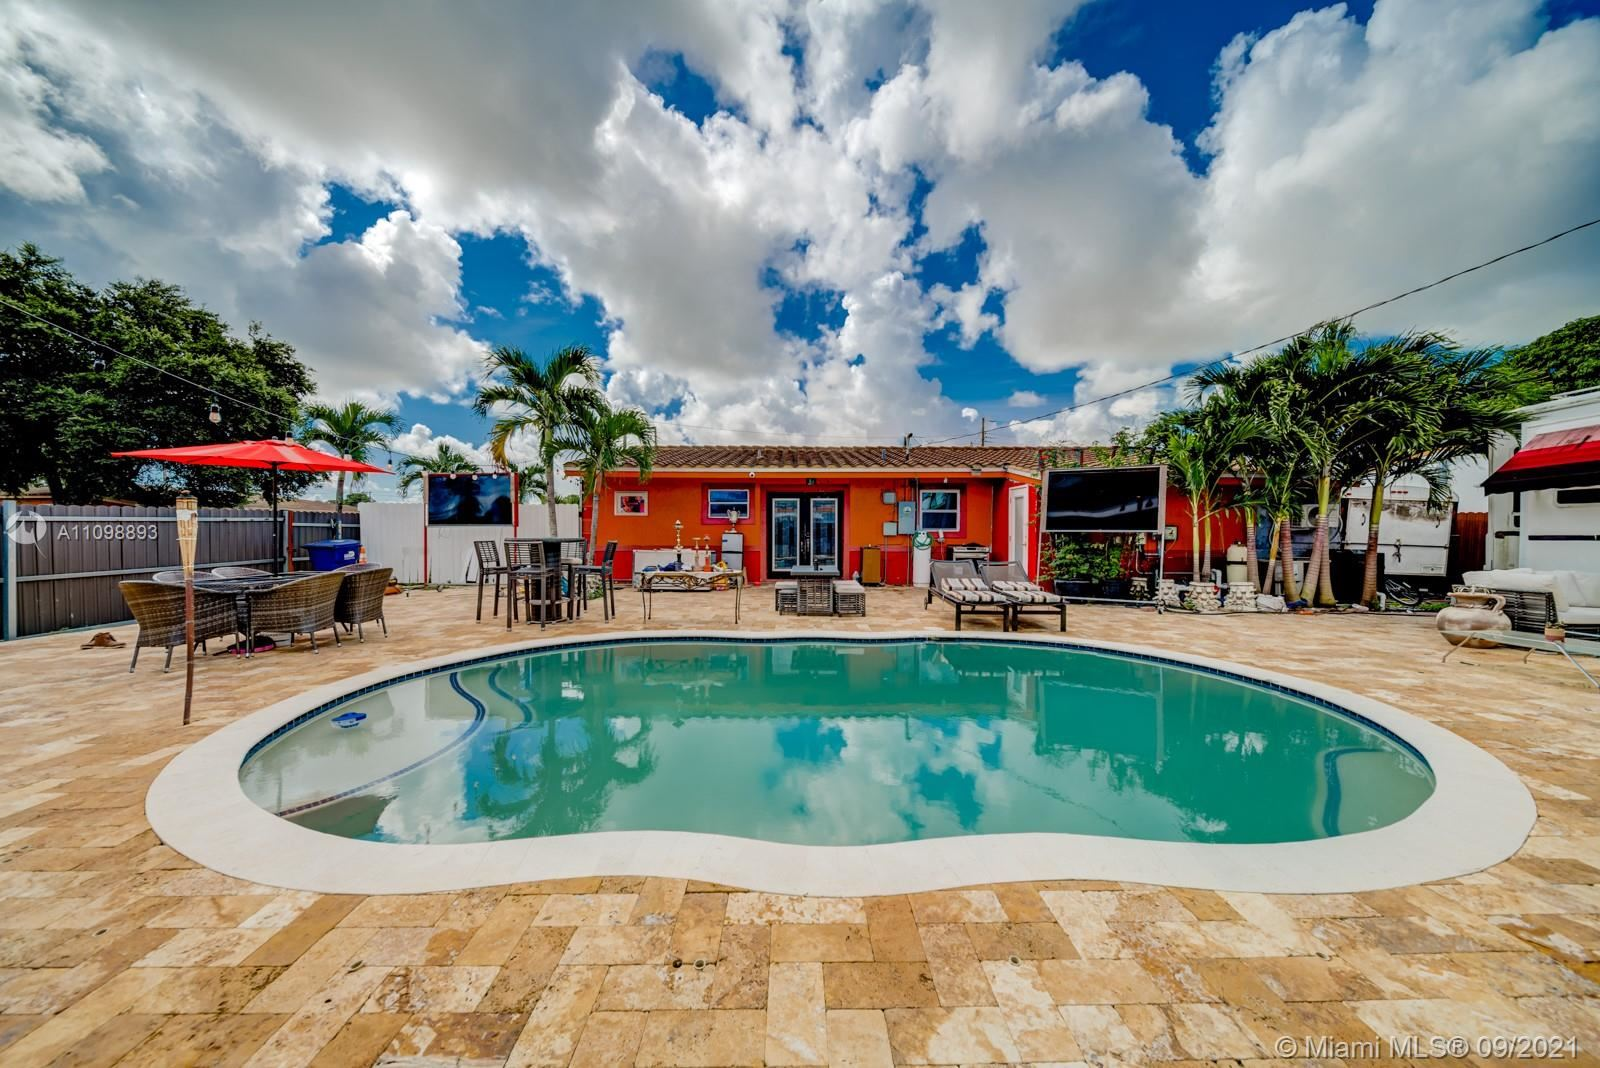 2901 NW 156th St, Miami Gardens, FL 33054 - #: A11098893